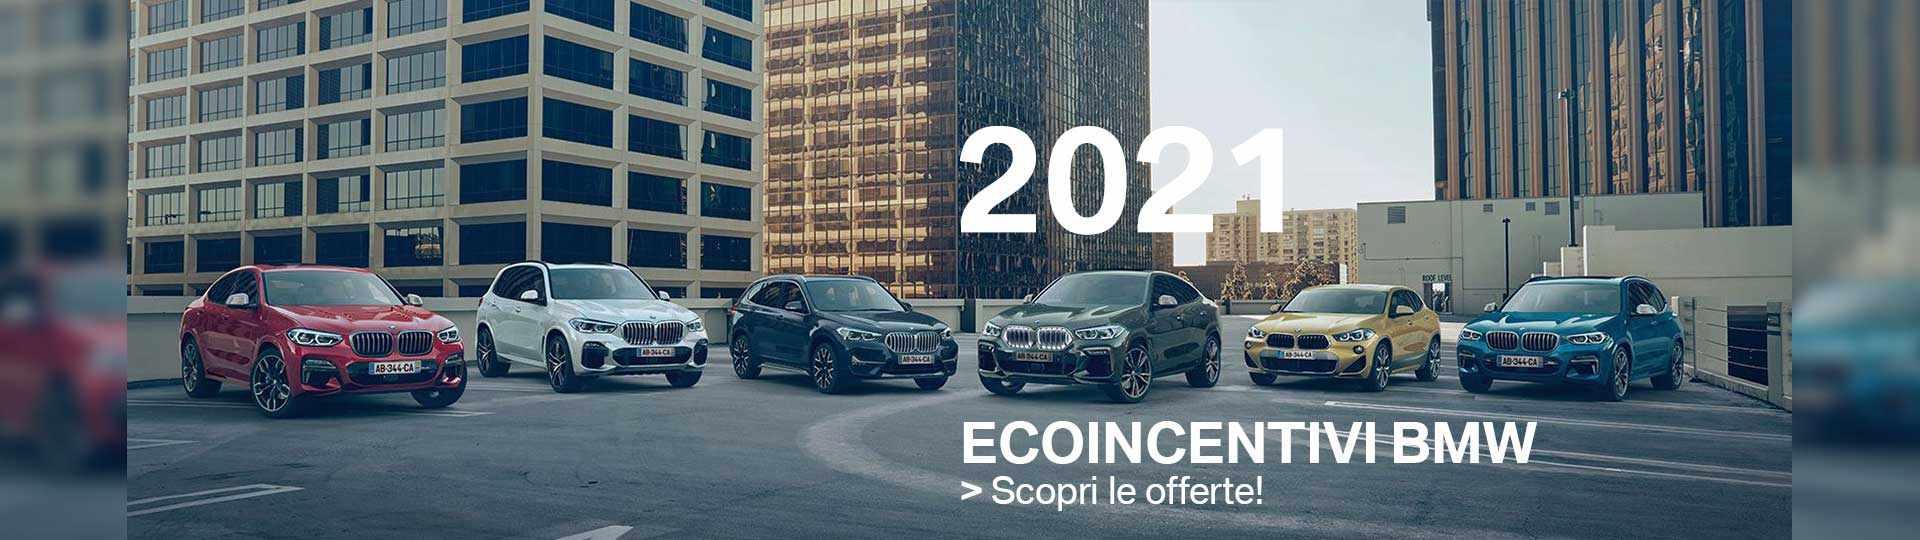 Ecoincentivi-BMW-2021_sito-min.jpg